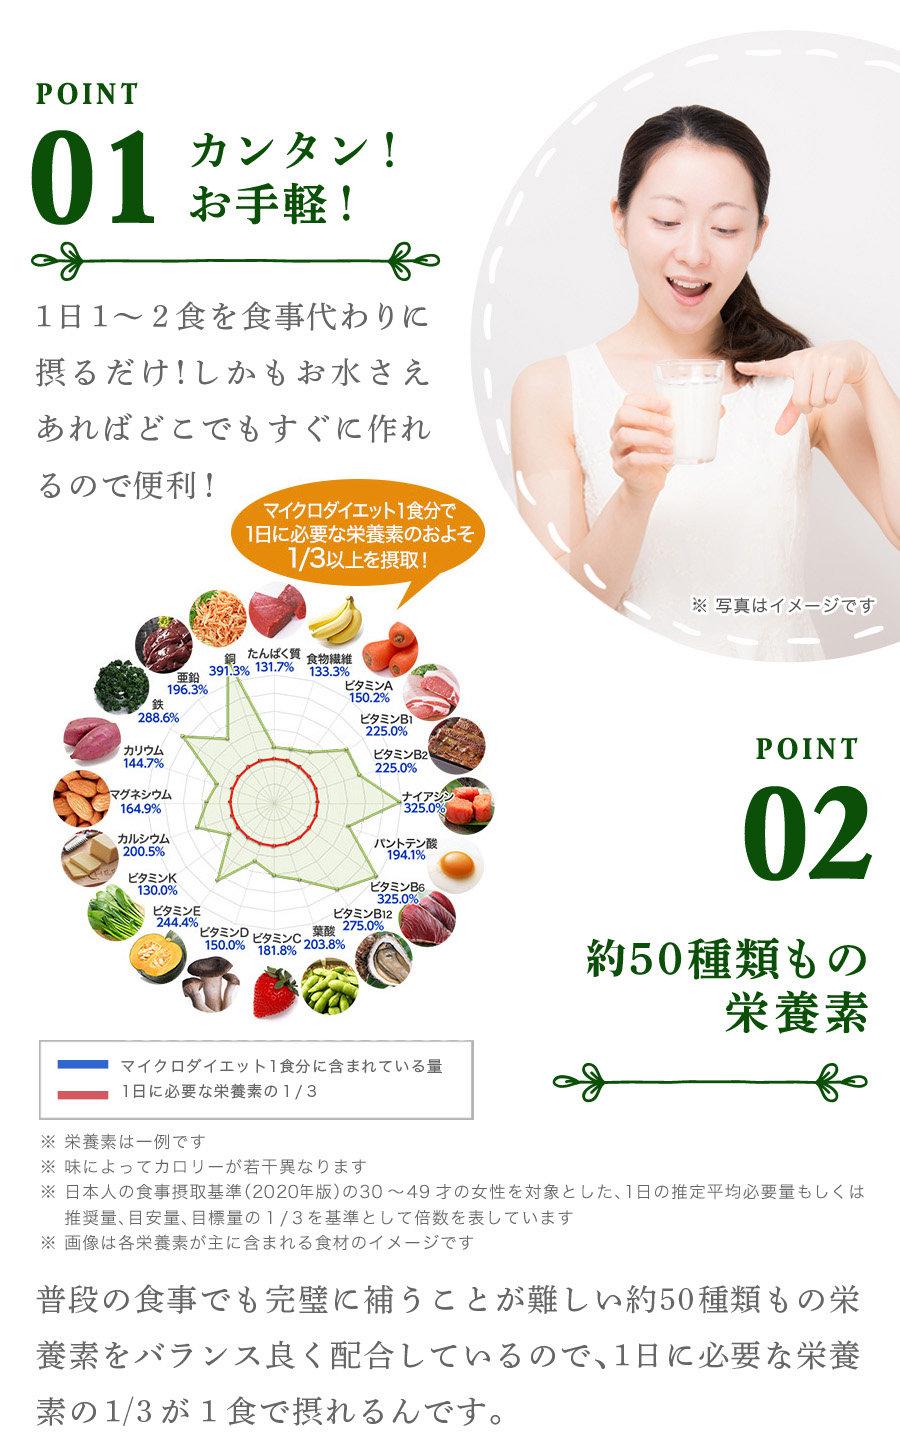 point01_02_new.jpg